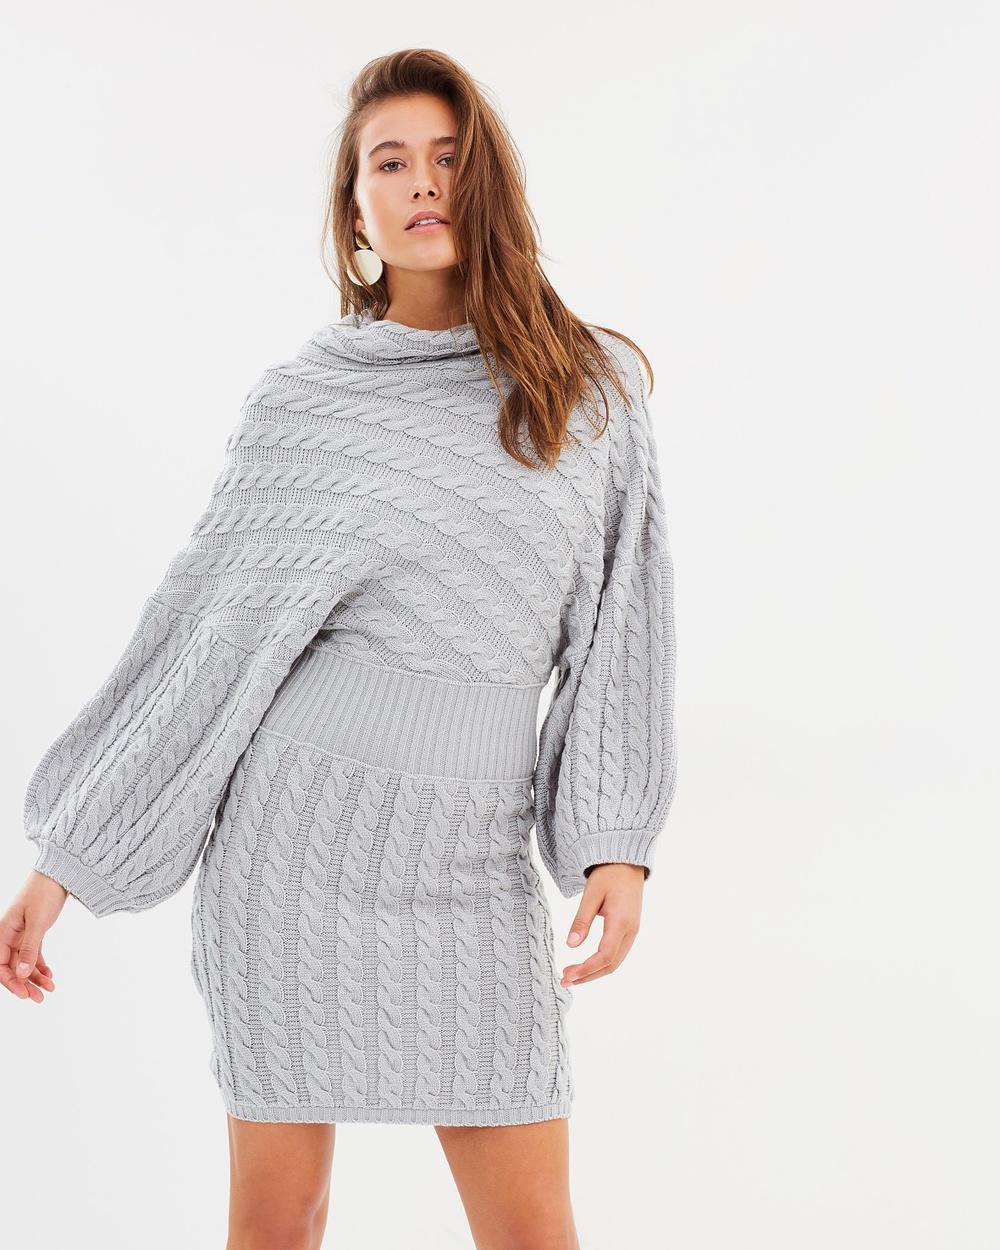 Maurie & Eve Devotion Dress Dresses Grey Devotion Dress